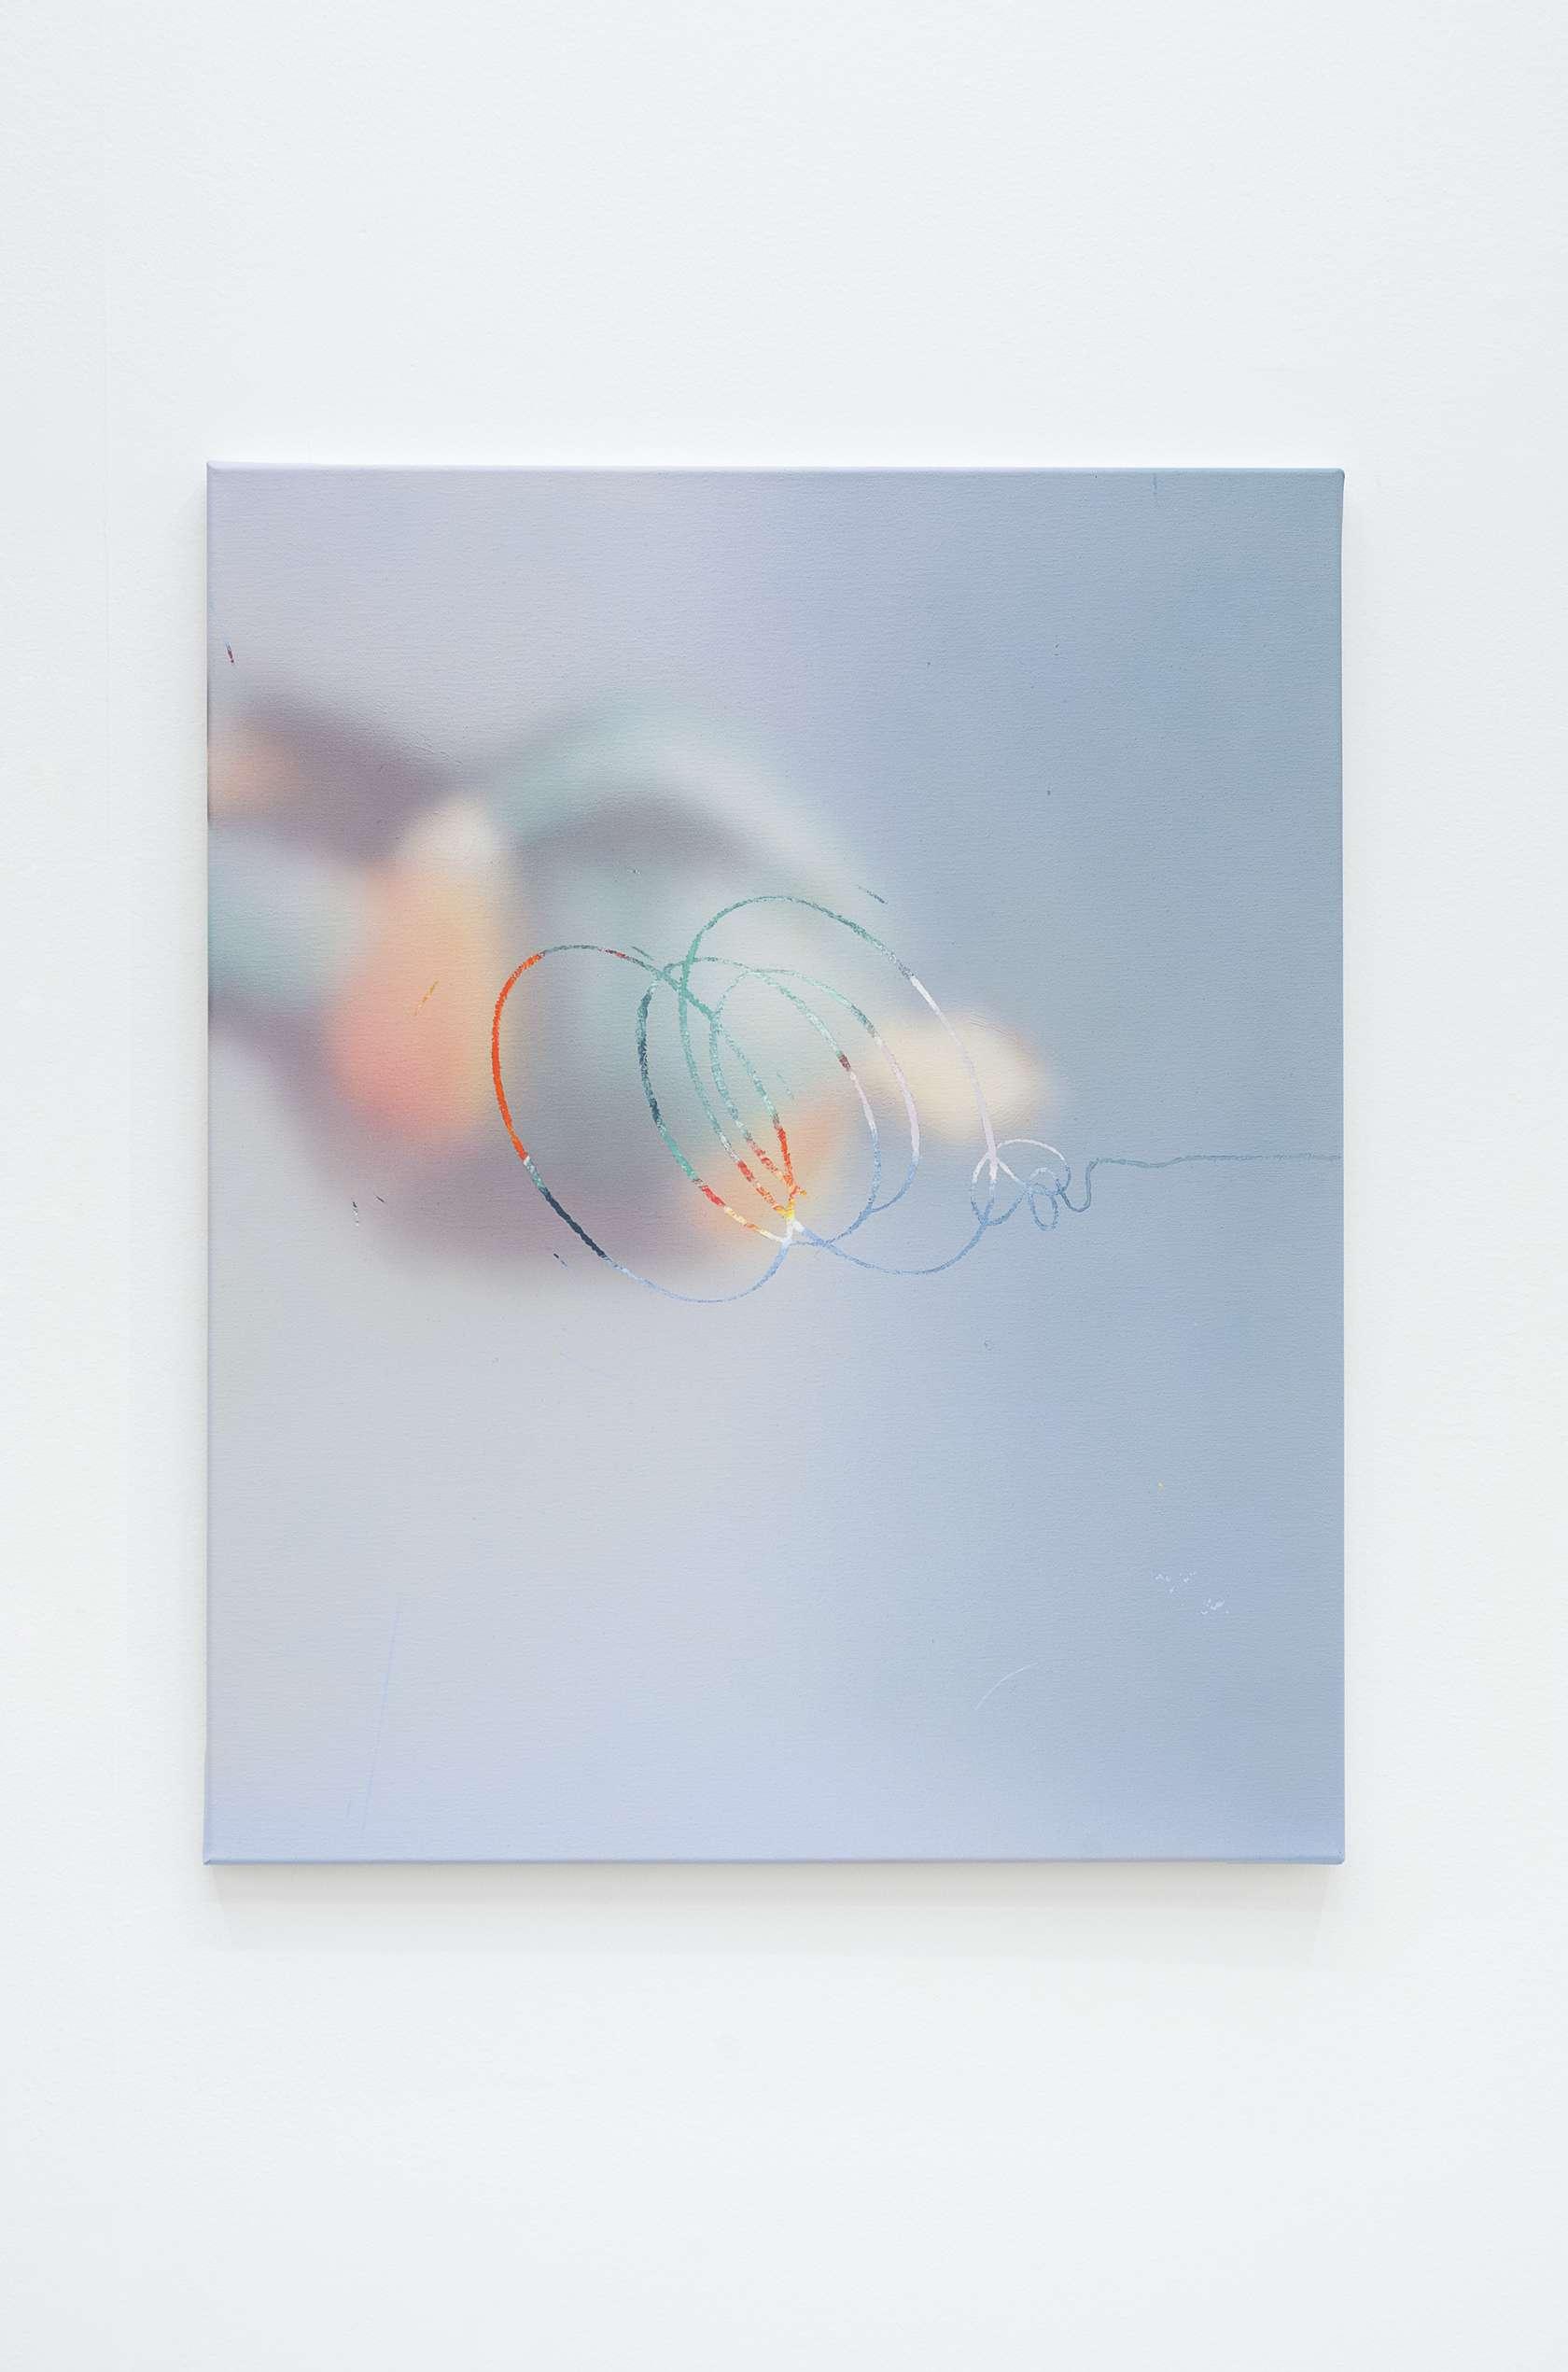 Julien Tiberi, O (Balloon Knot), 2017 Acrylique sur toile80 × 65 cm / 31 1/2 × 25 5/8 in.